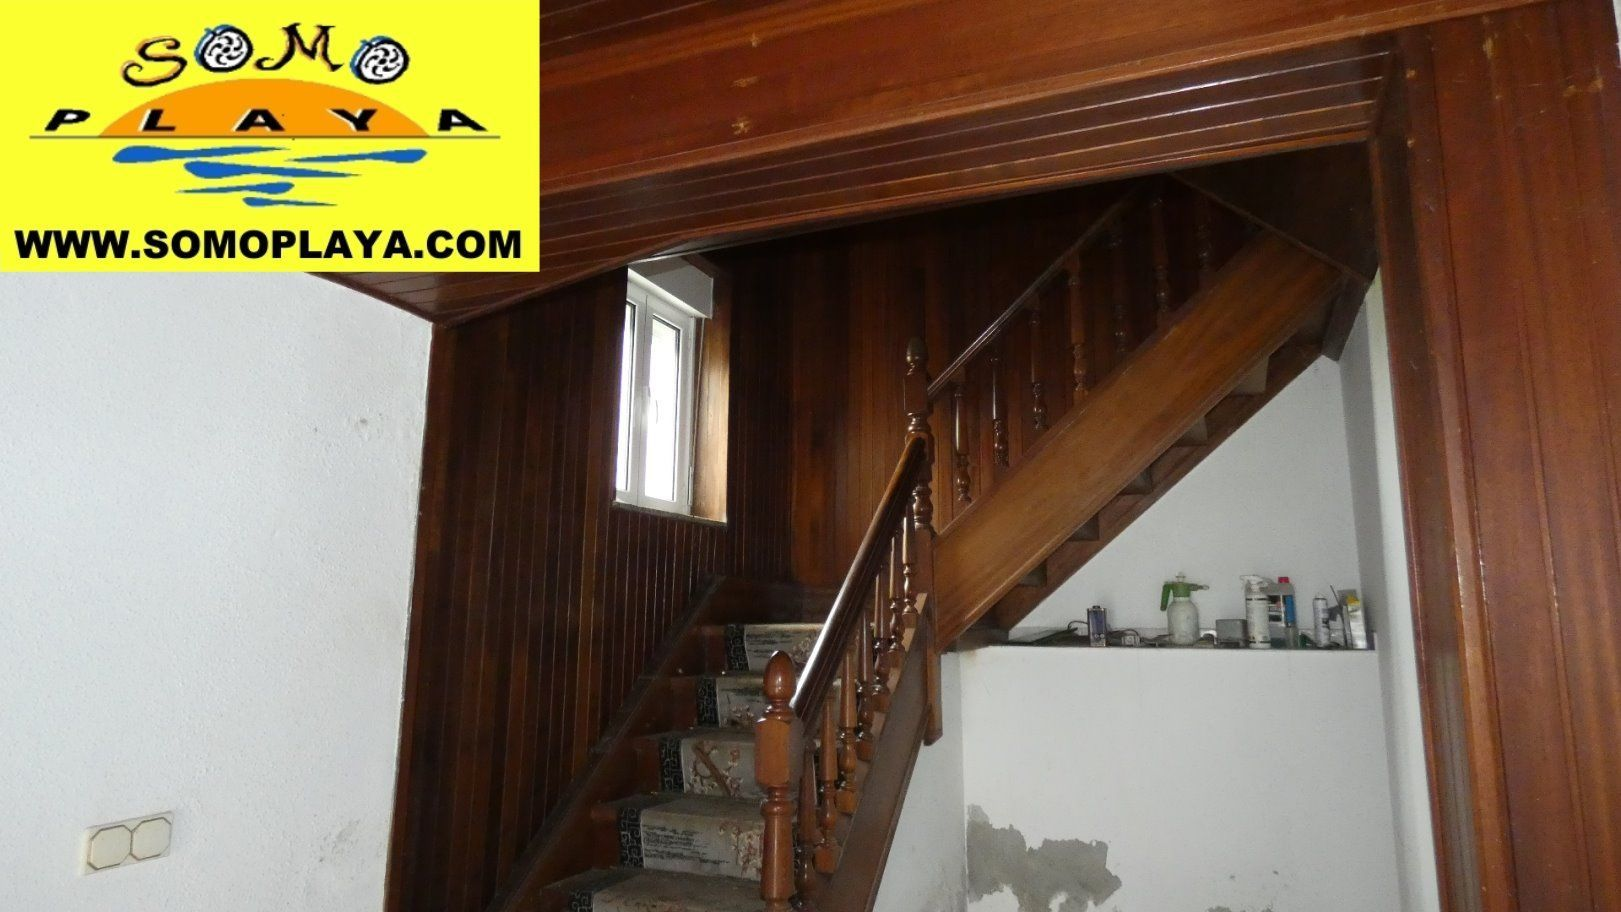 Villa en venta en Ribamontán al Monte